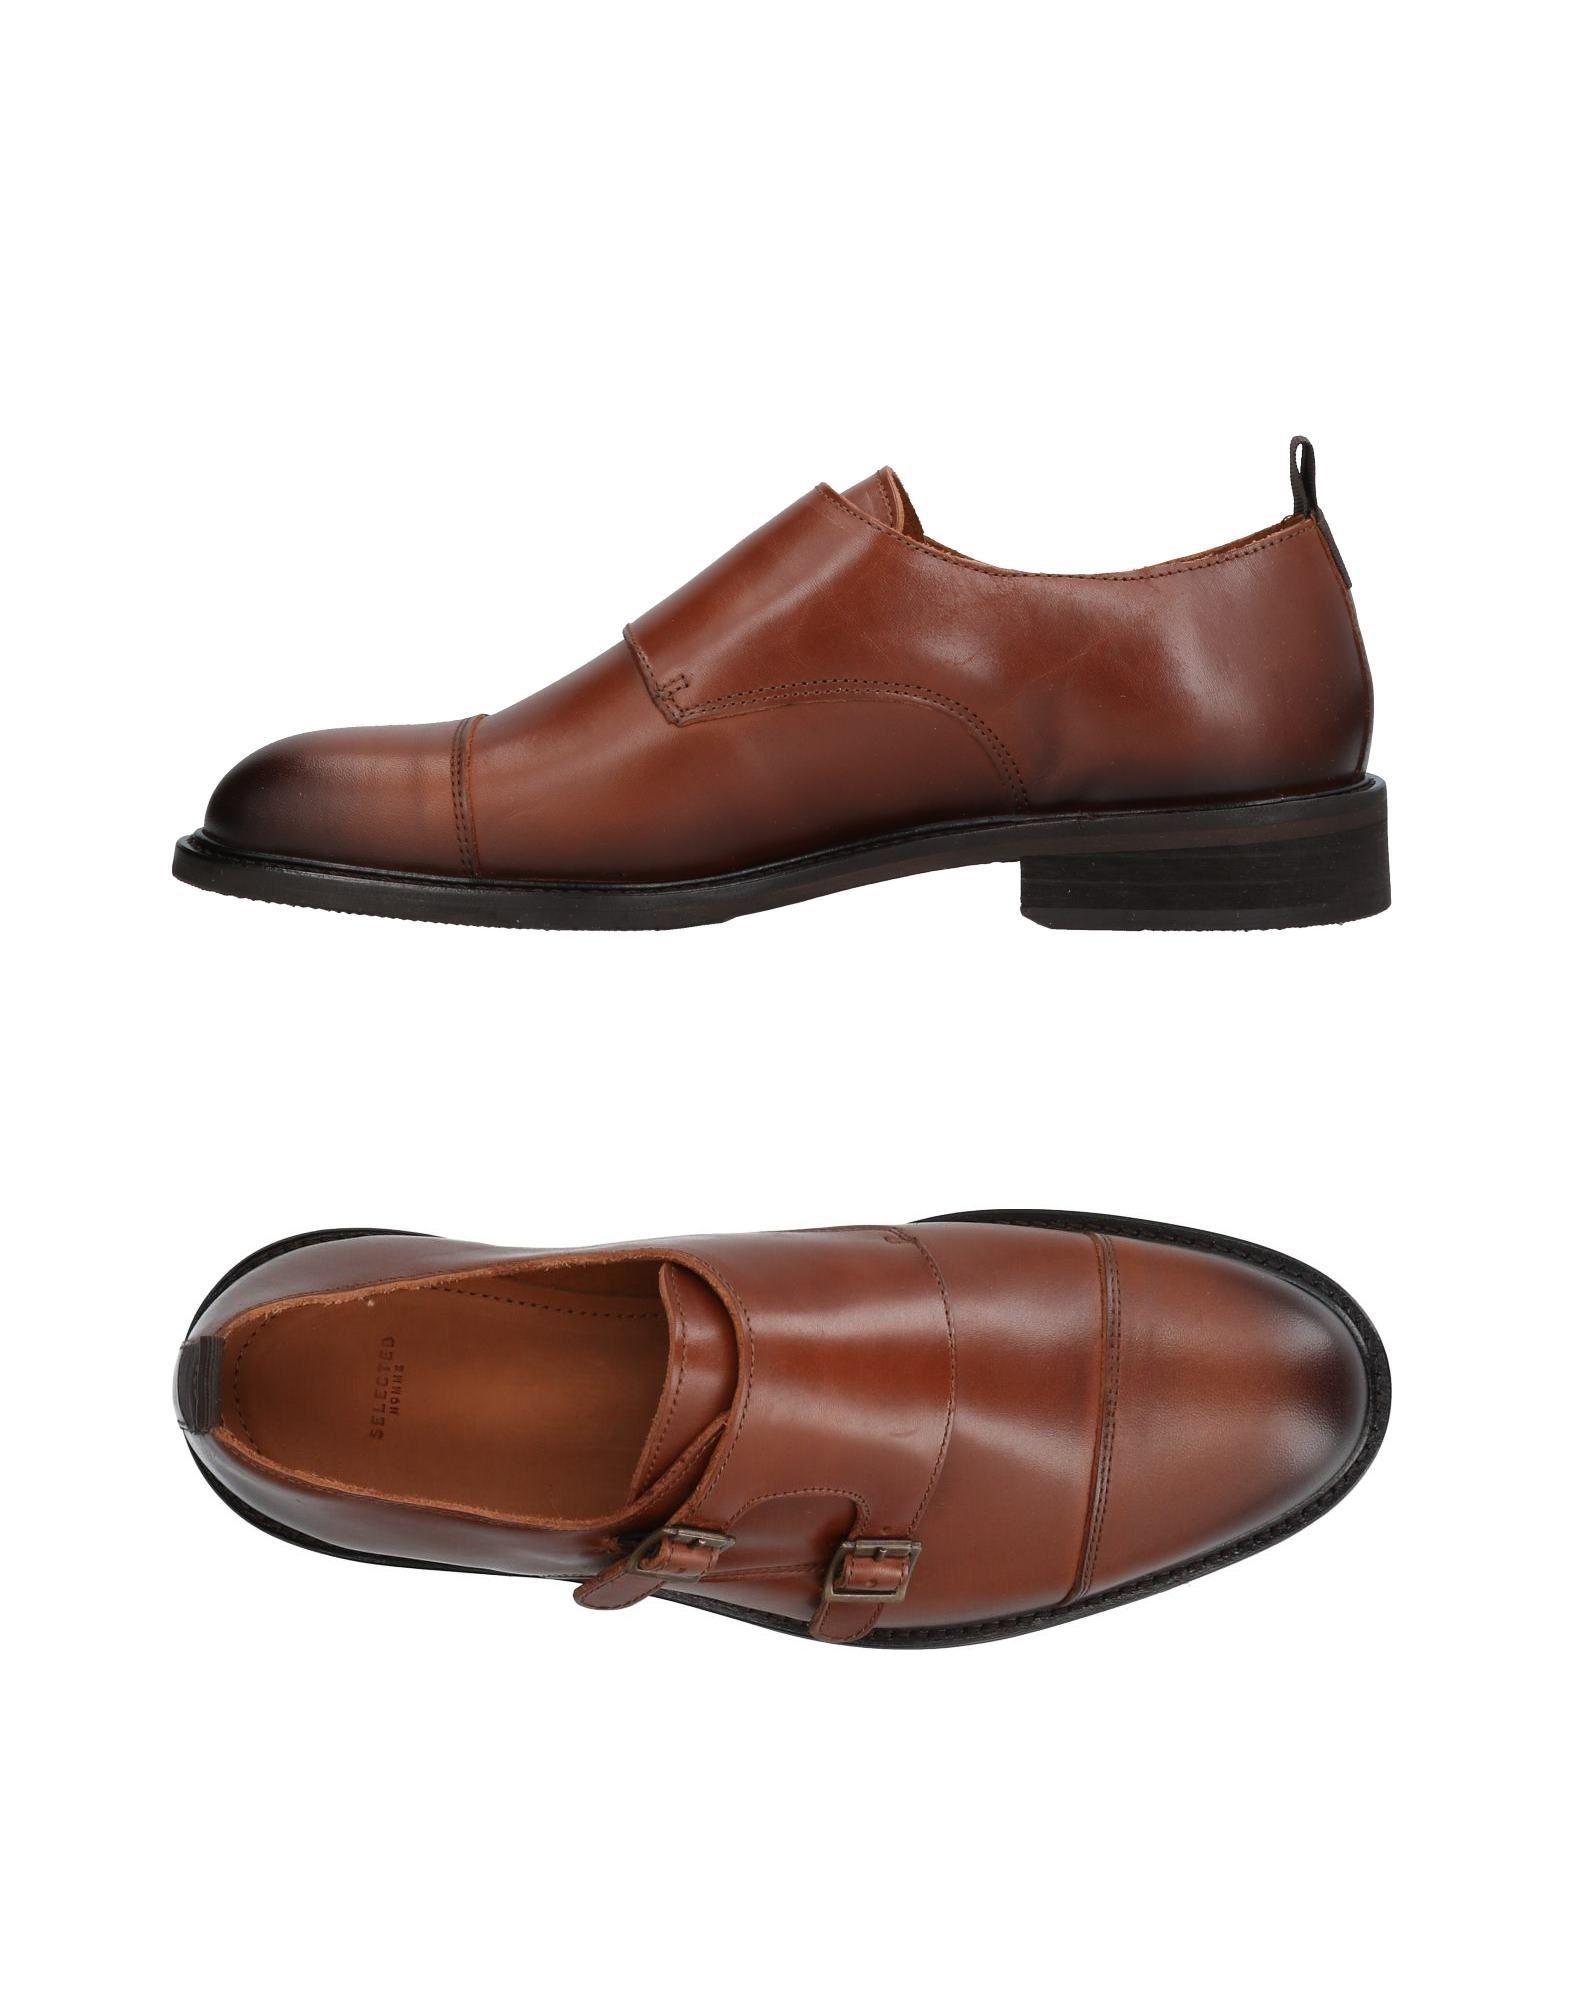 Rabatt echte Schuhe Selected Homme Mokassins Herren  11440014MA